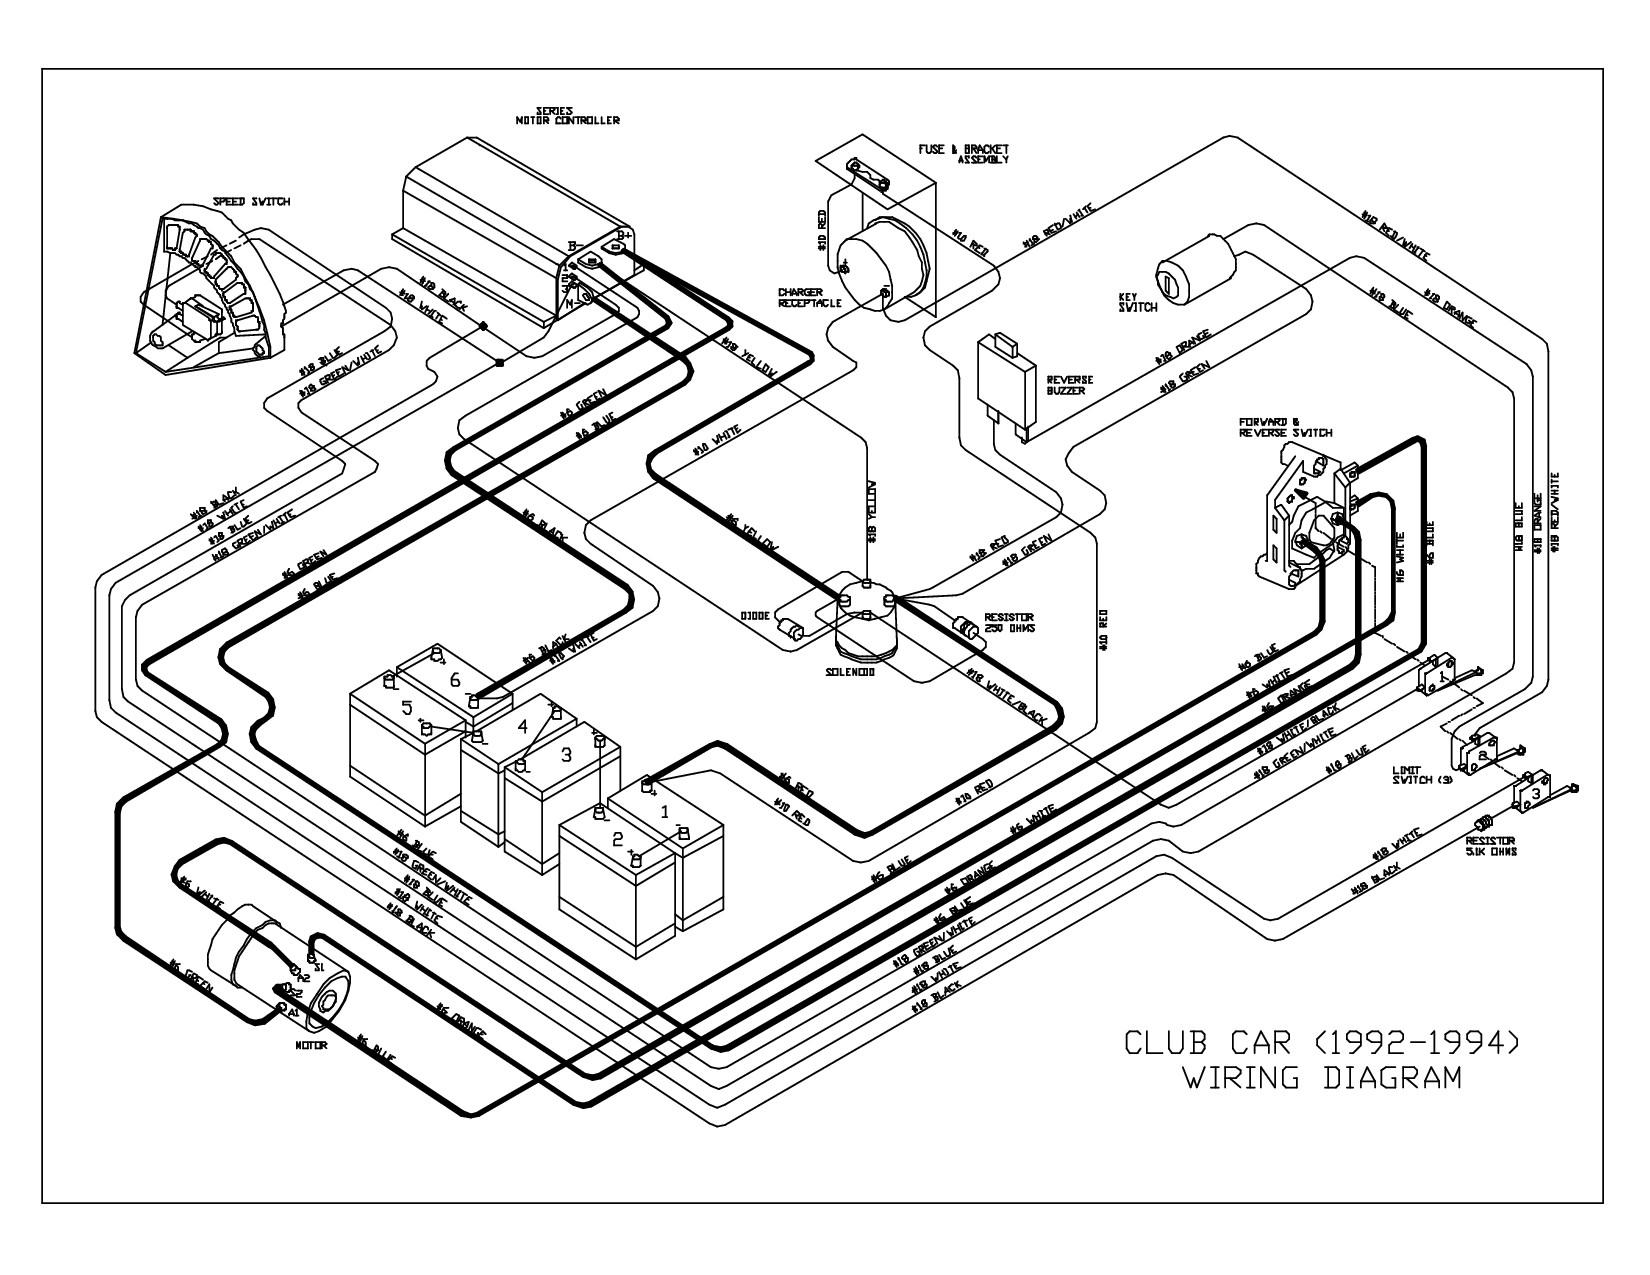 1992 Honda Accord Engine Diagram Automotive Wiring Diagram 1992 Honda Accord Wiring Diagram Speed Of 1992 Honda Accord Engine Diagram